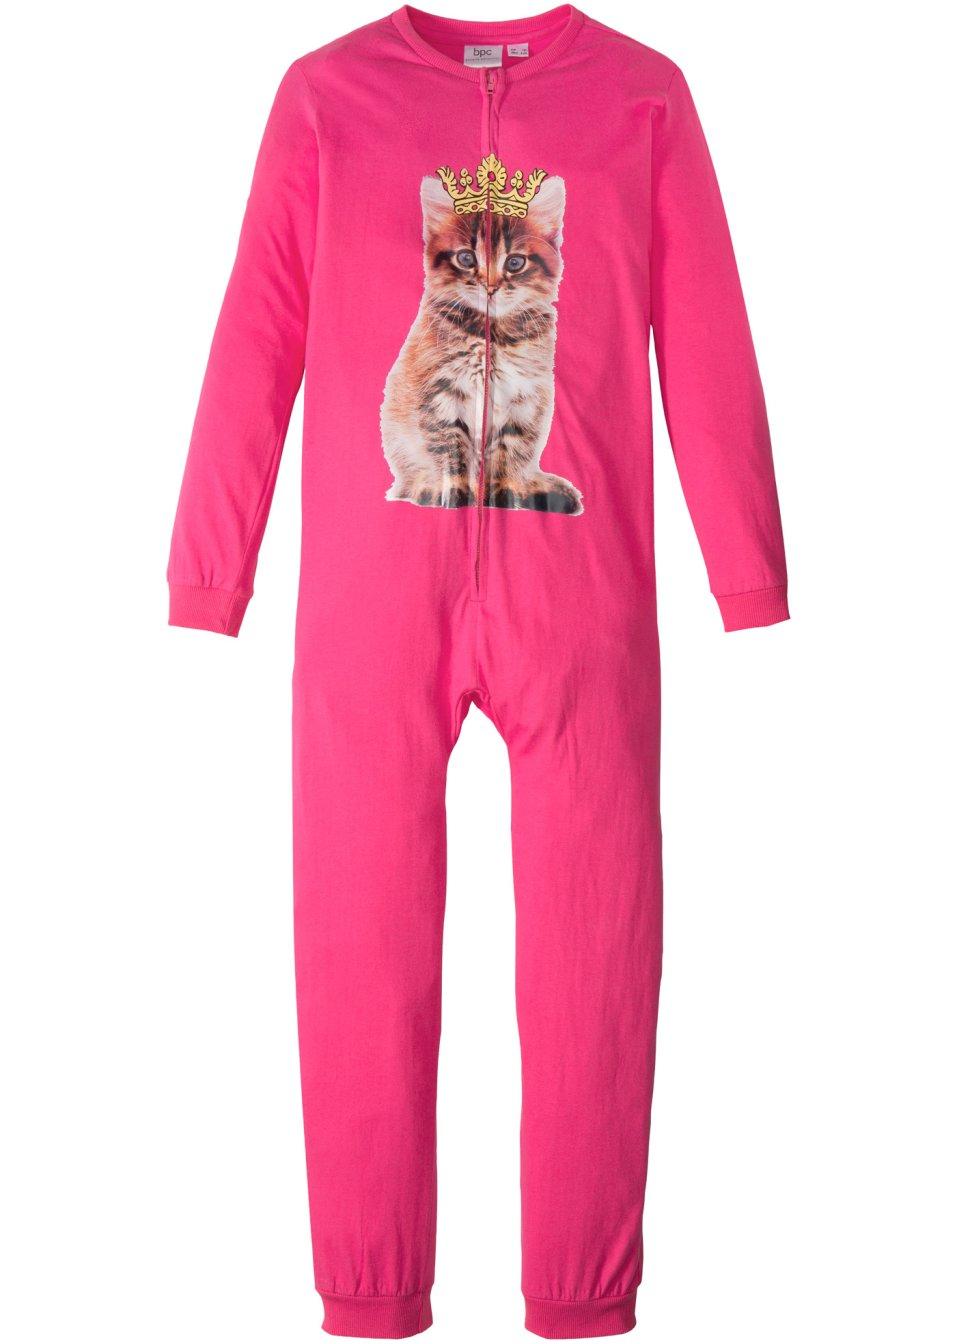 abb69416907a43 Schlaf JUMPSUIT Pyjama Overall Schlafanzug Kinder Mädchen Schlaf ...